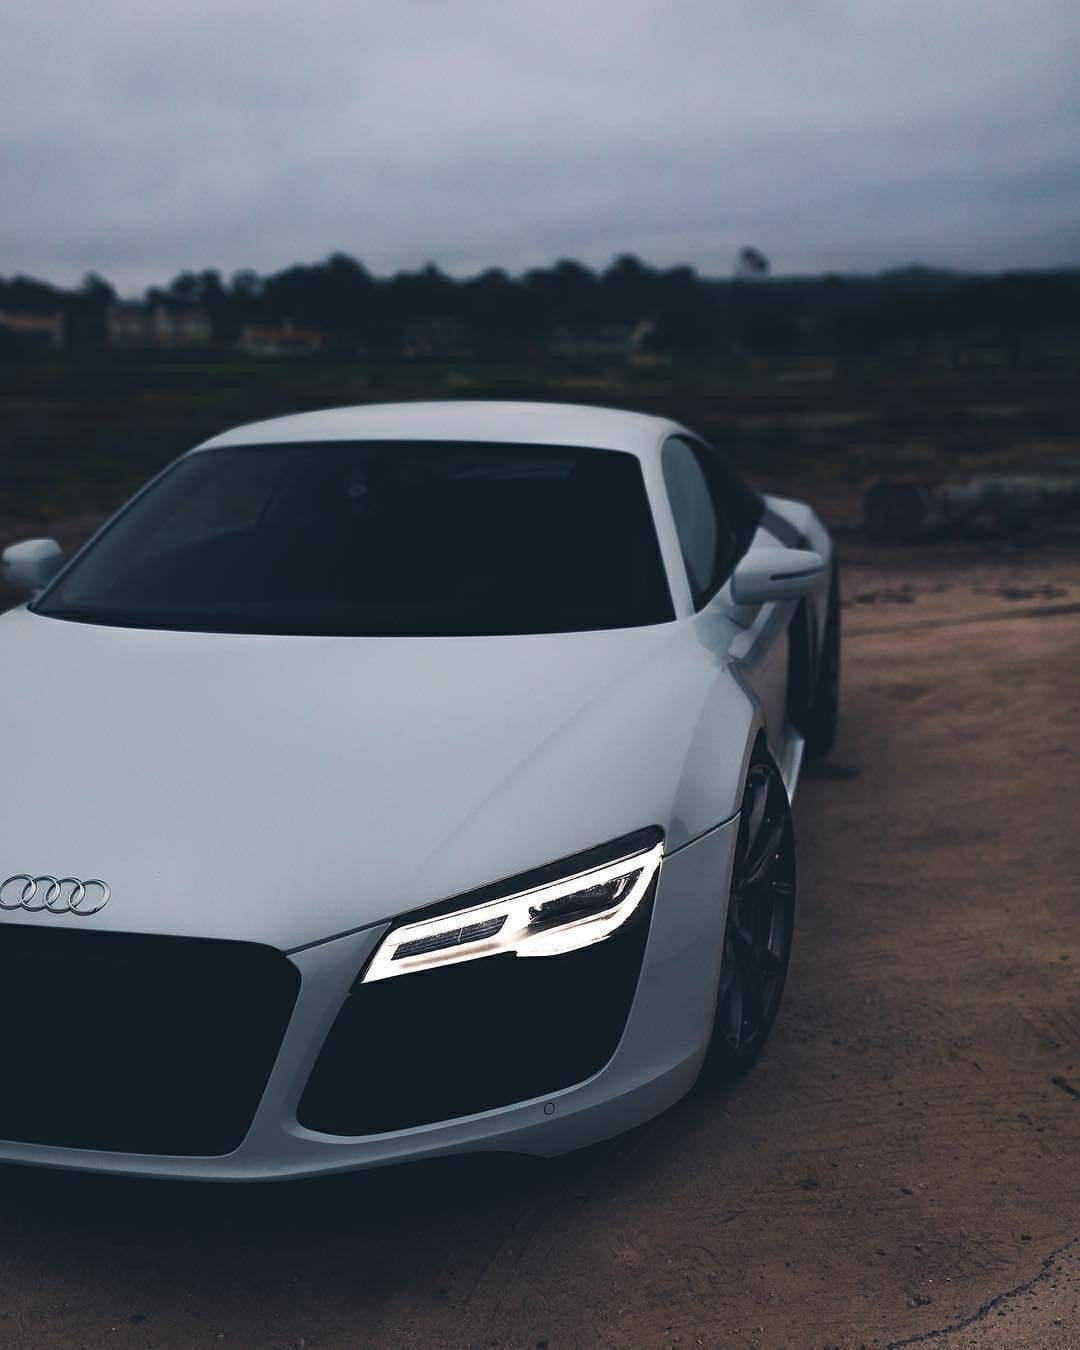 Pin By Elizabethsmirnove On Future Cars Luxury Cars Audi Audi Cars Dream Cars